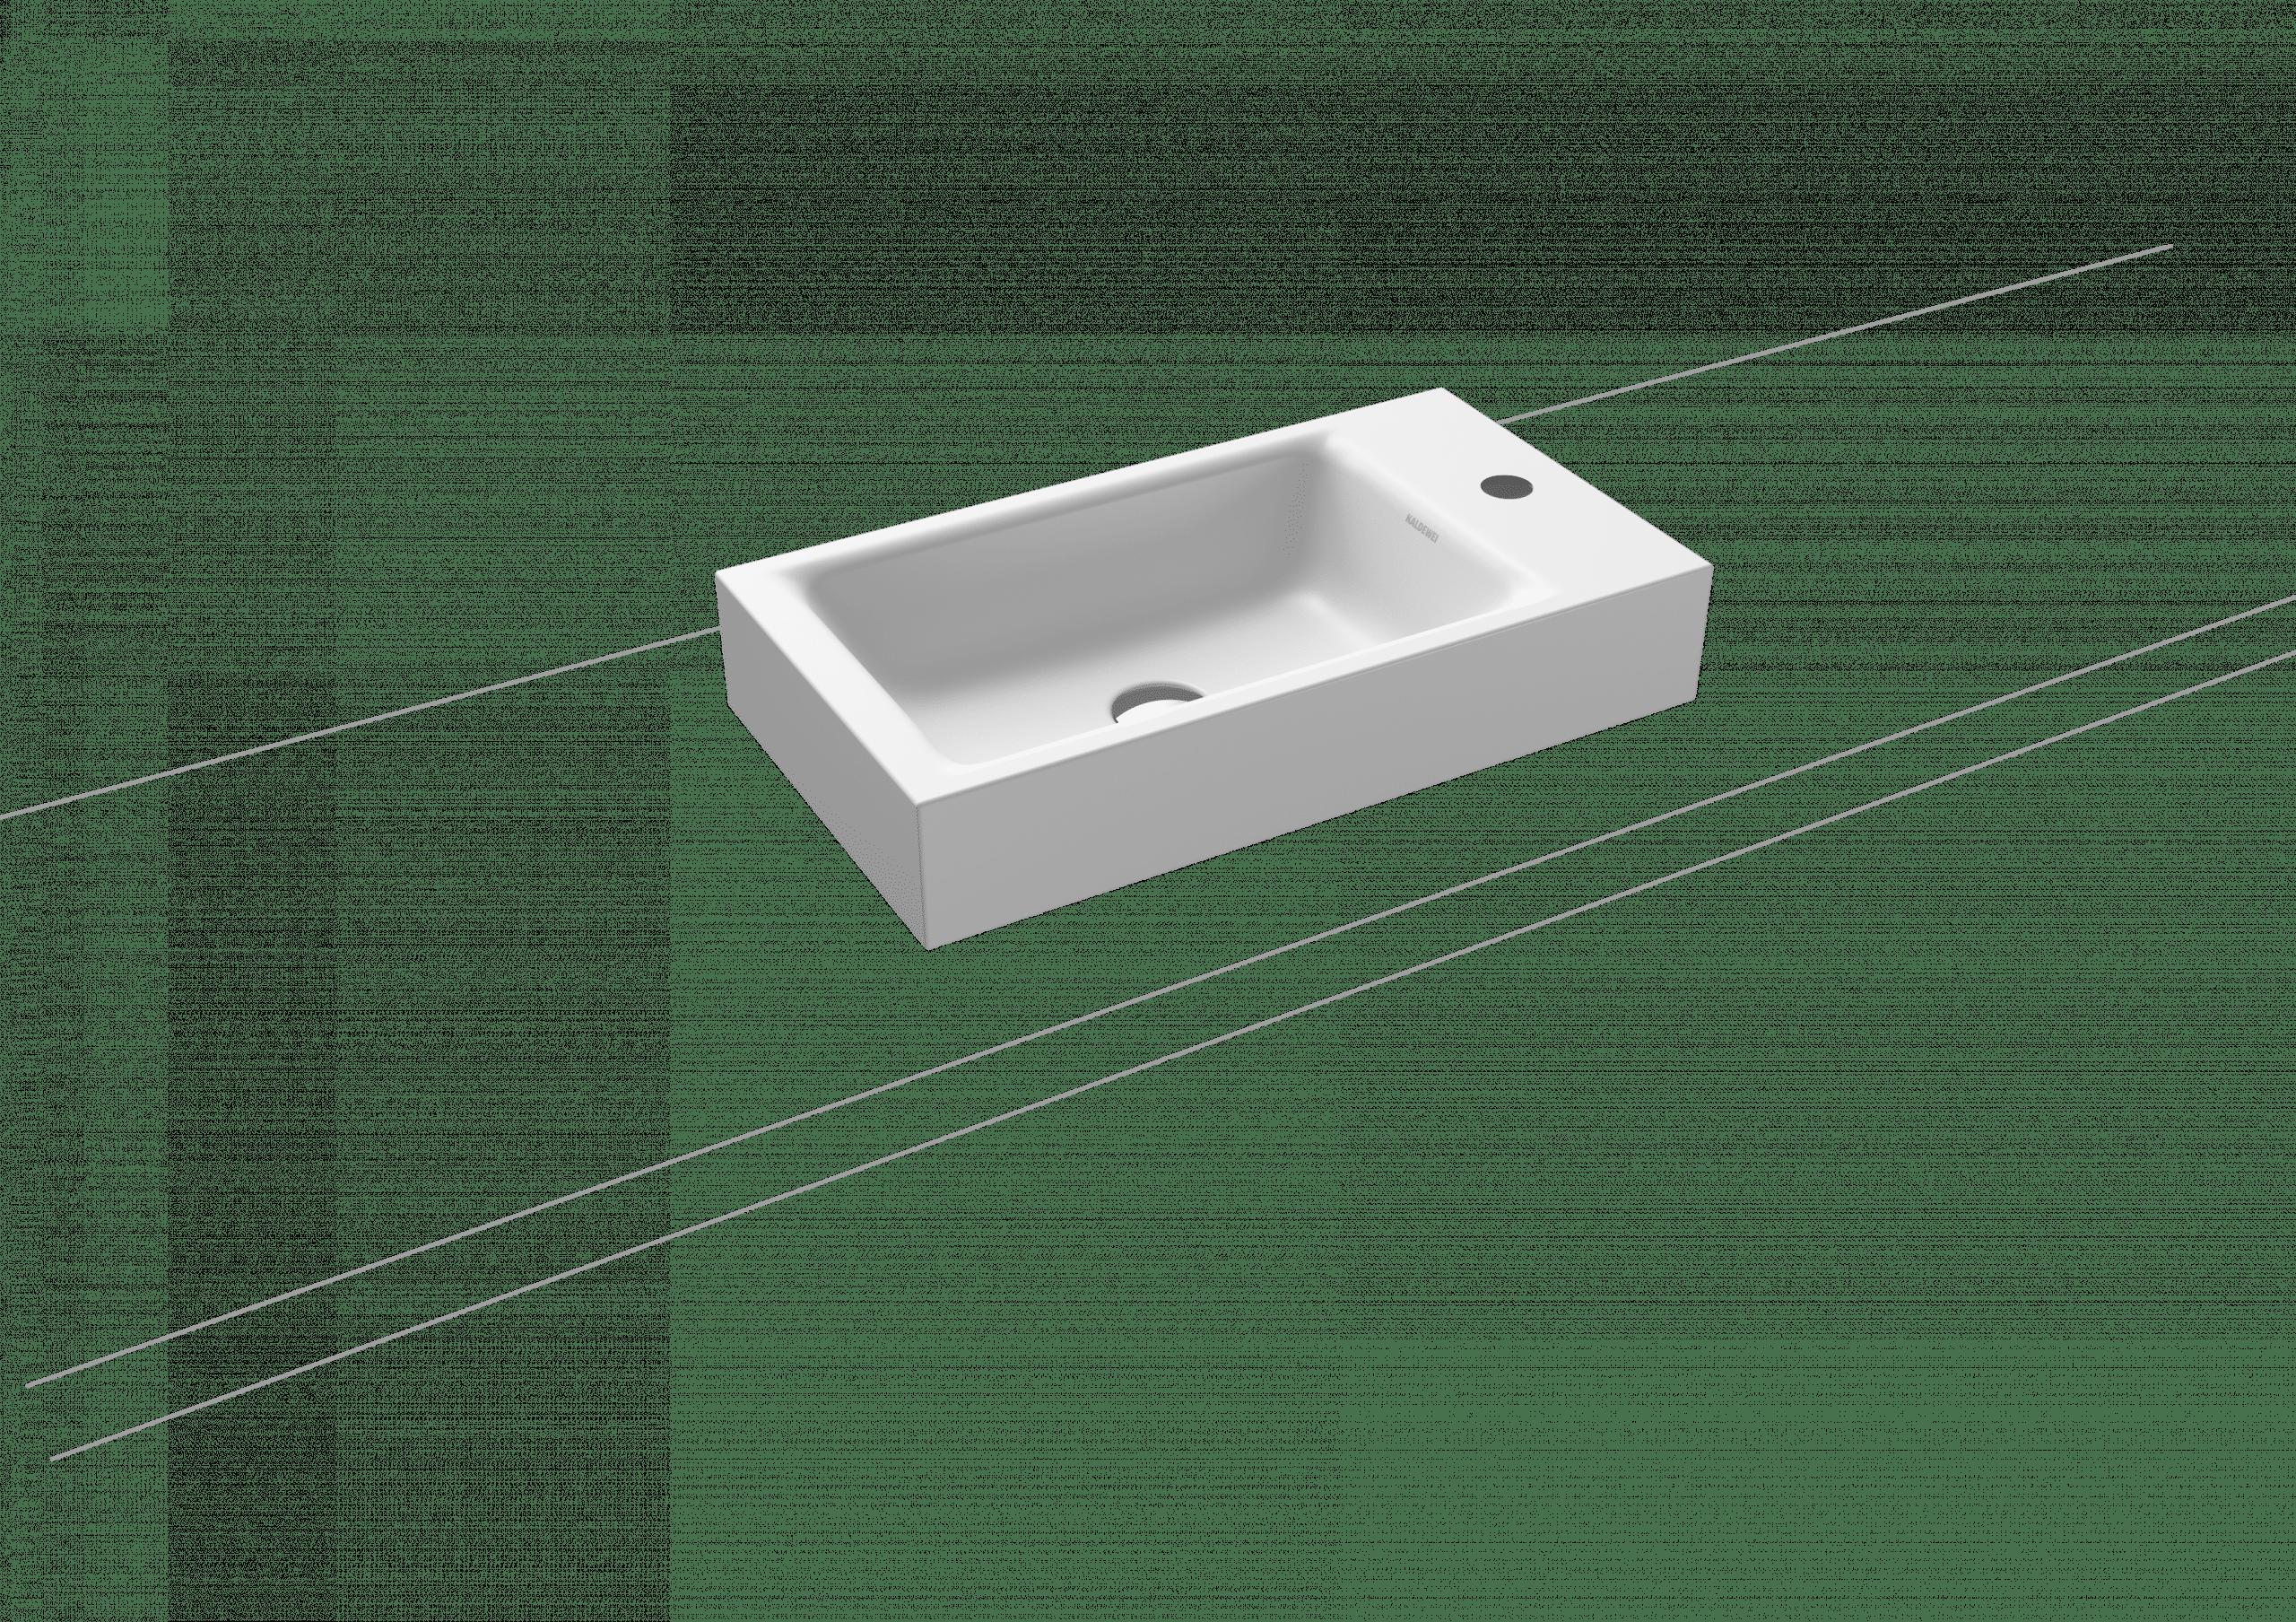 KALDEWEI Puro Handrinse Washbasin 20mm   Bathe